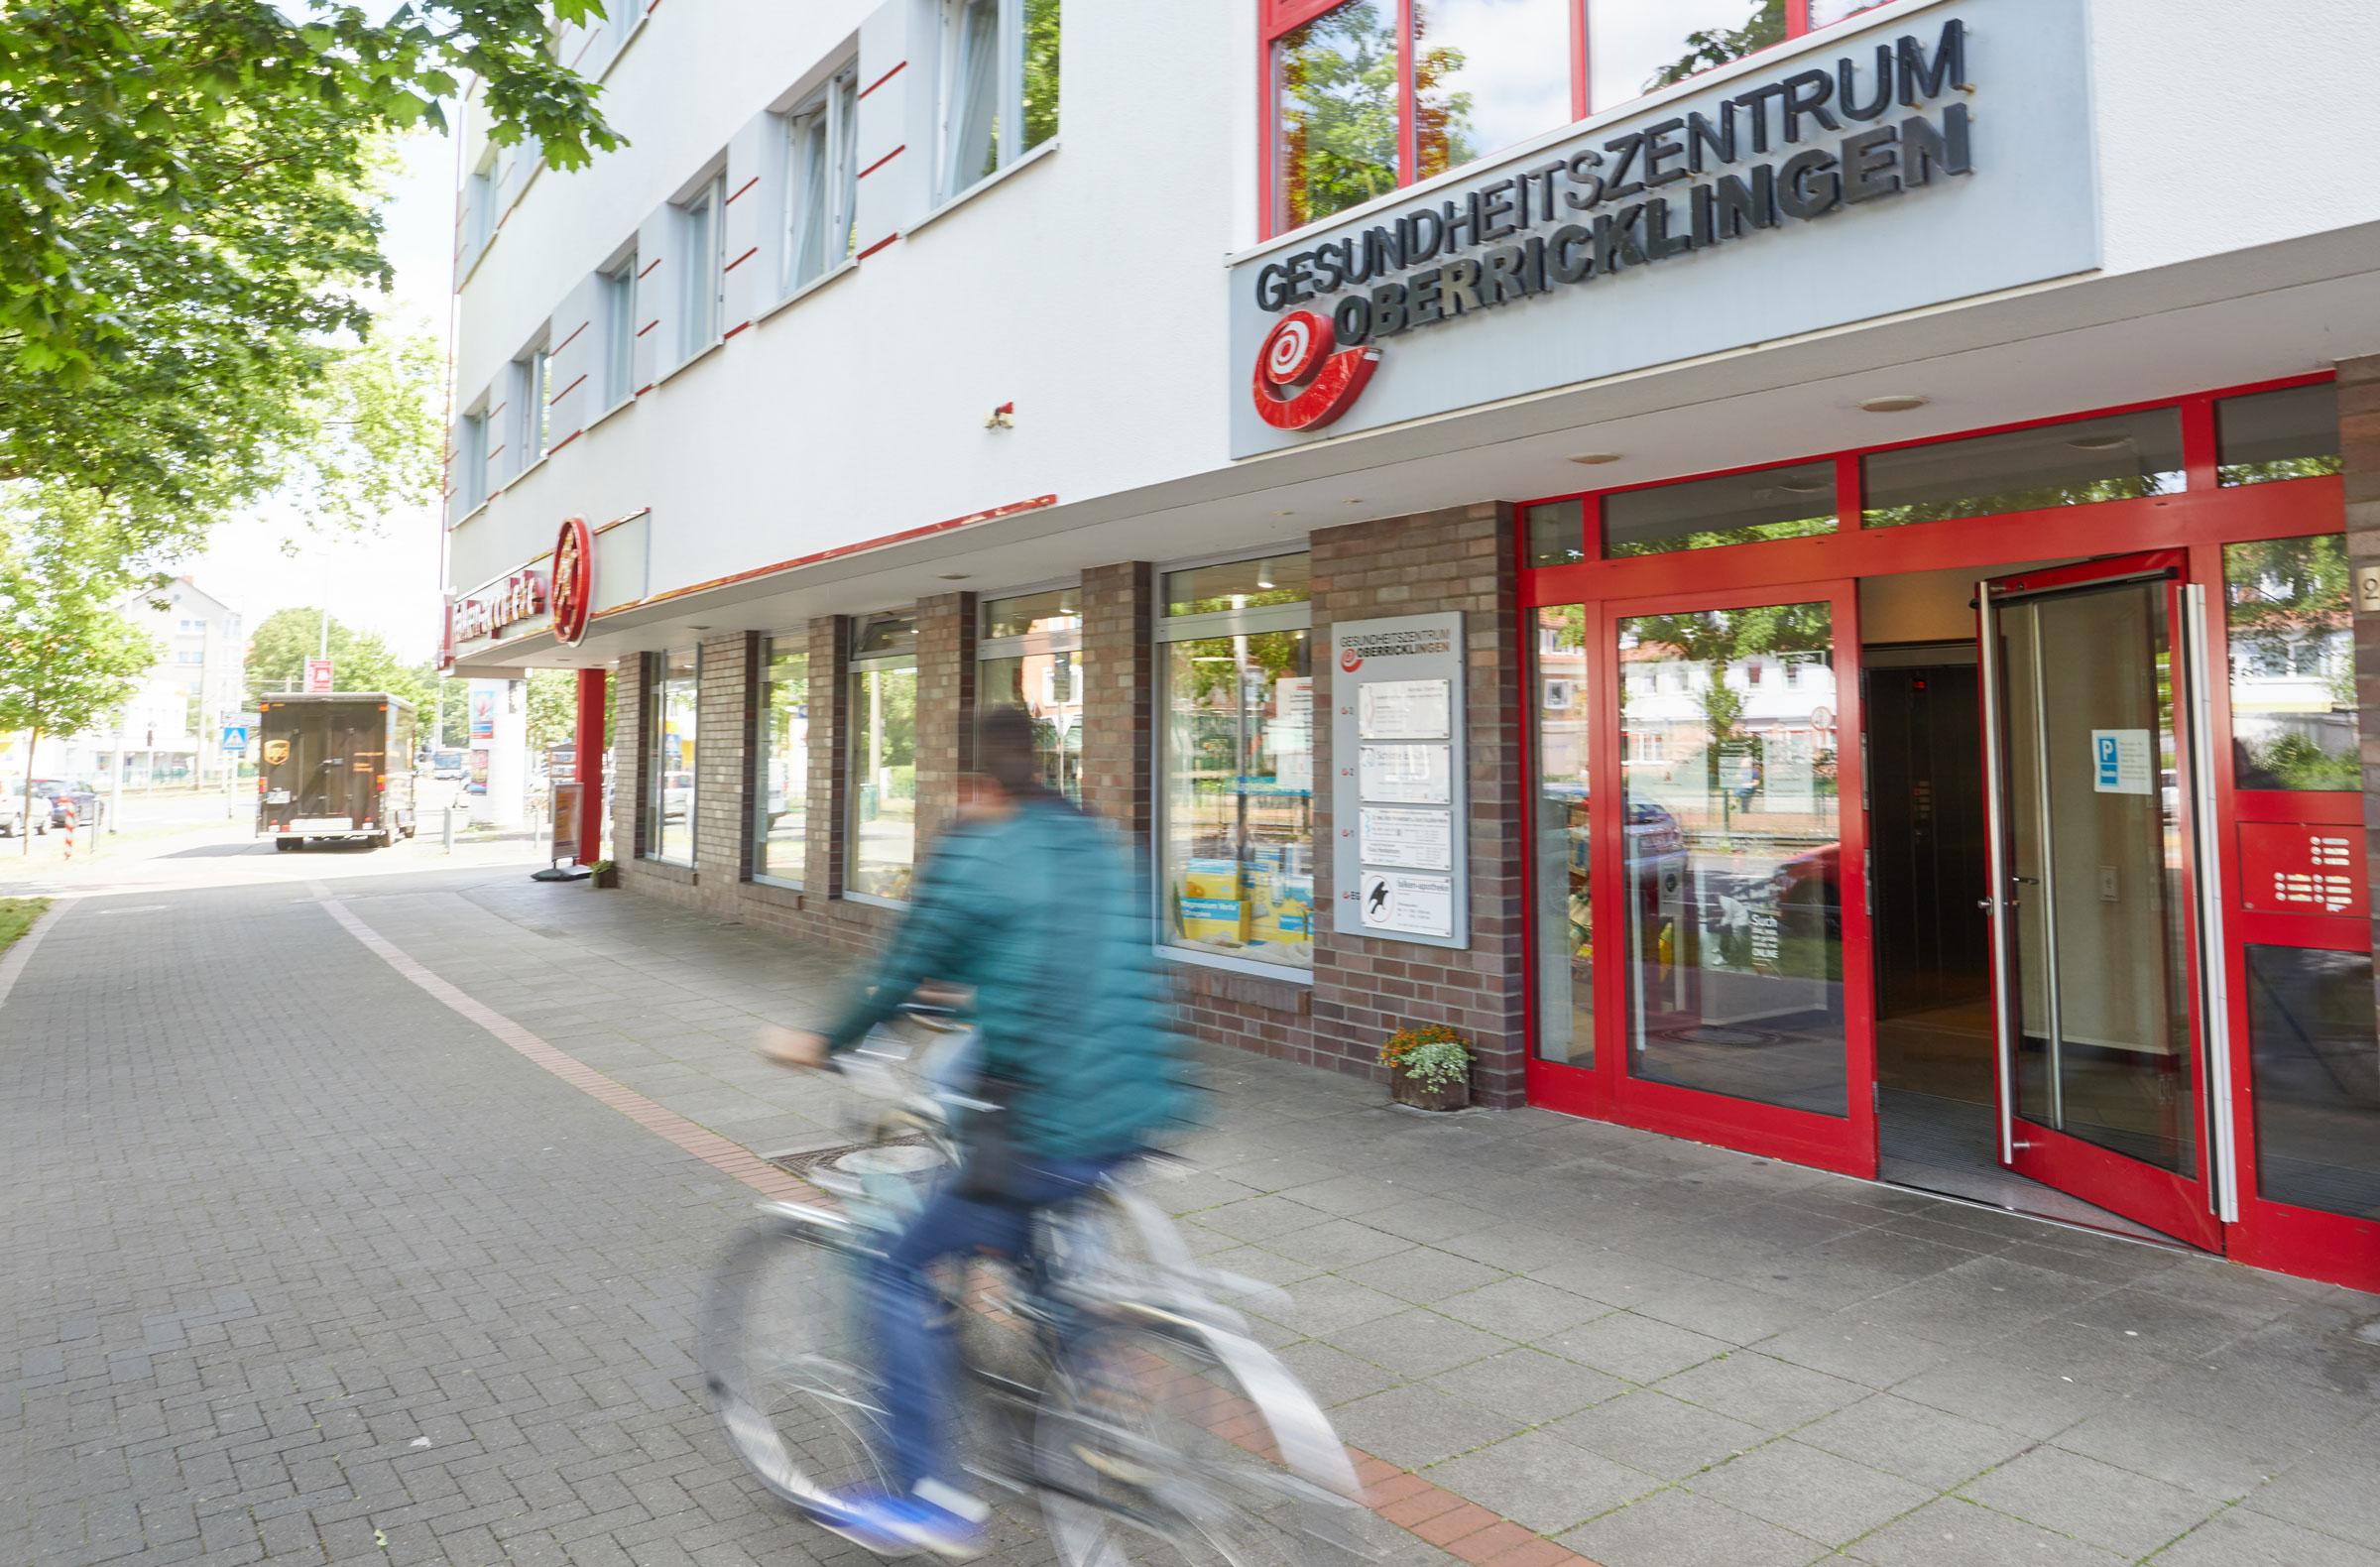 gesundheitszentrum_oberricklingen